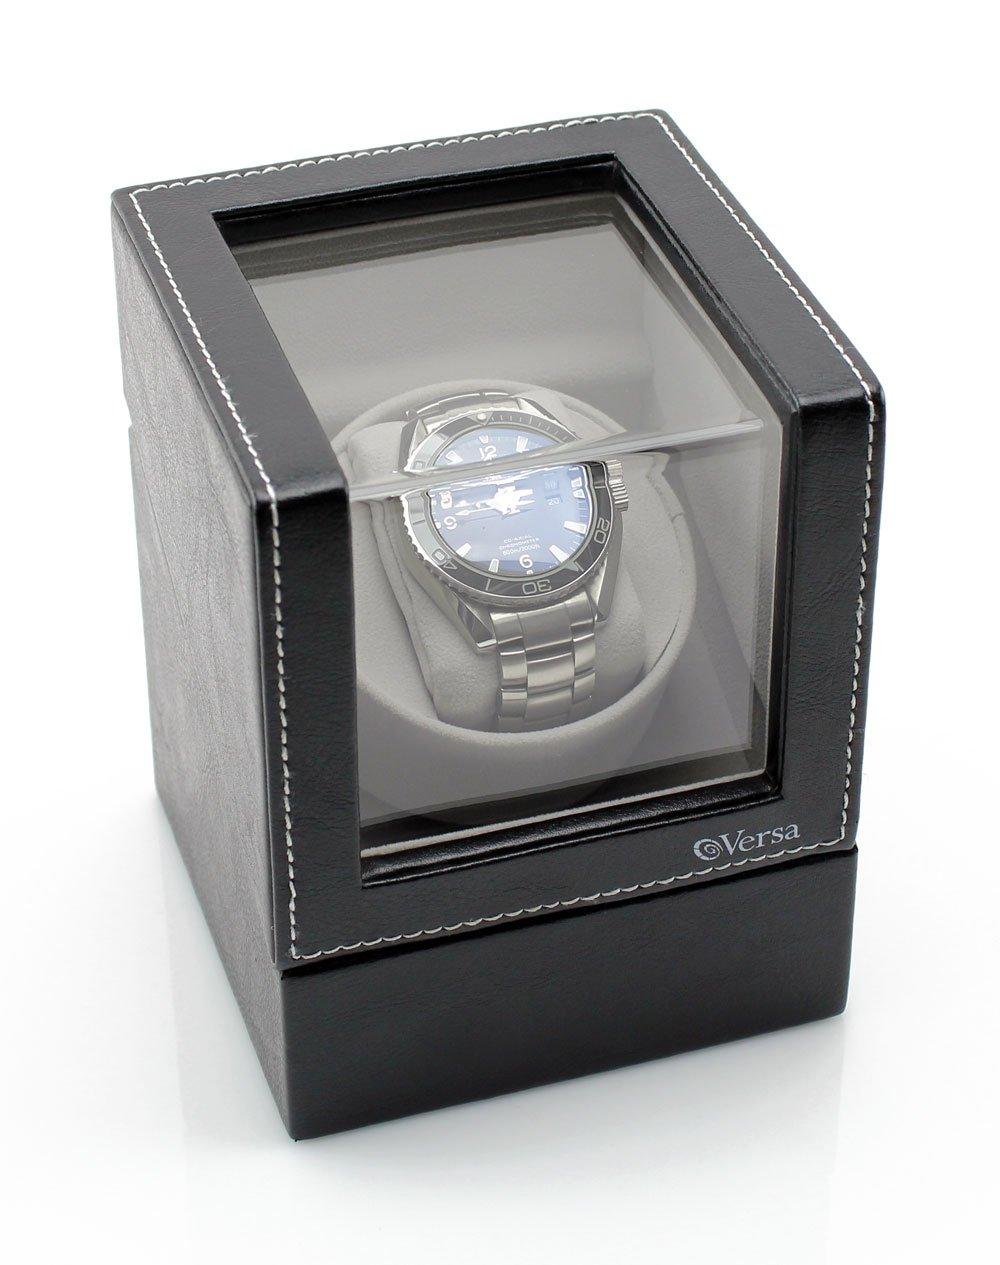 Versa Elite Single Watch Winder in Black Leather